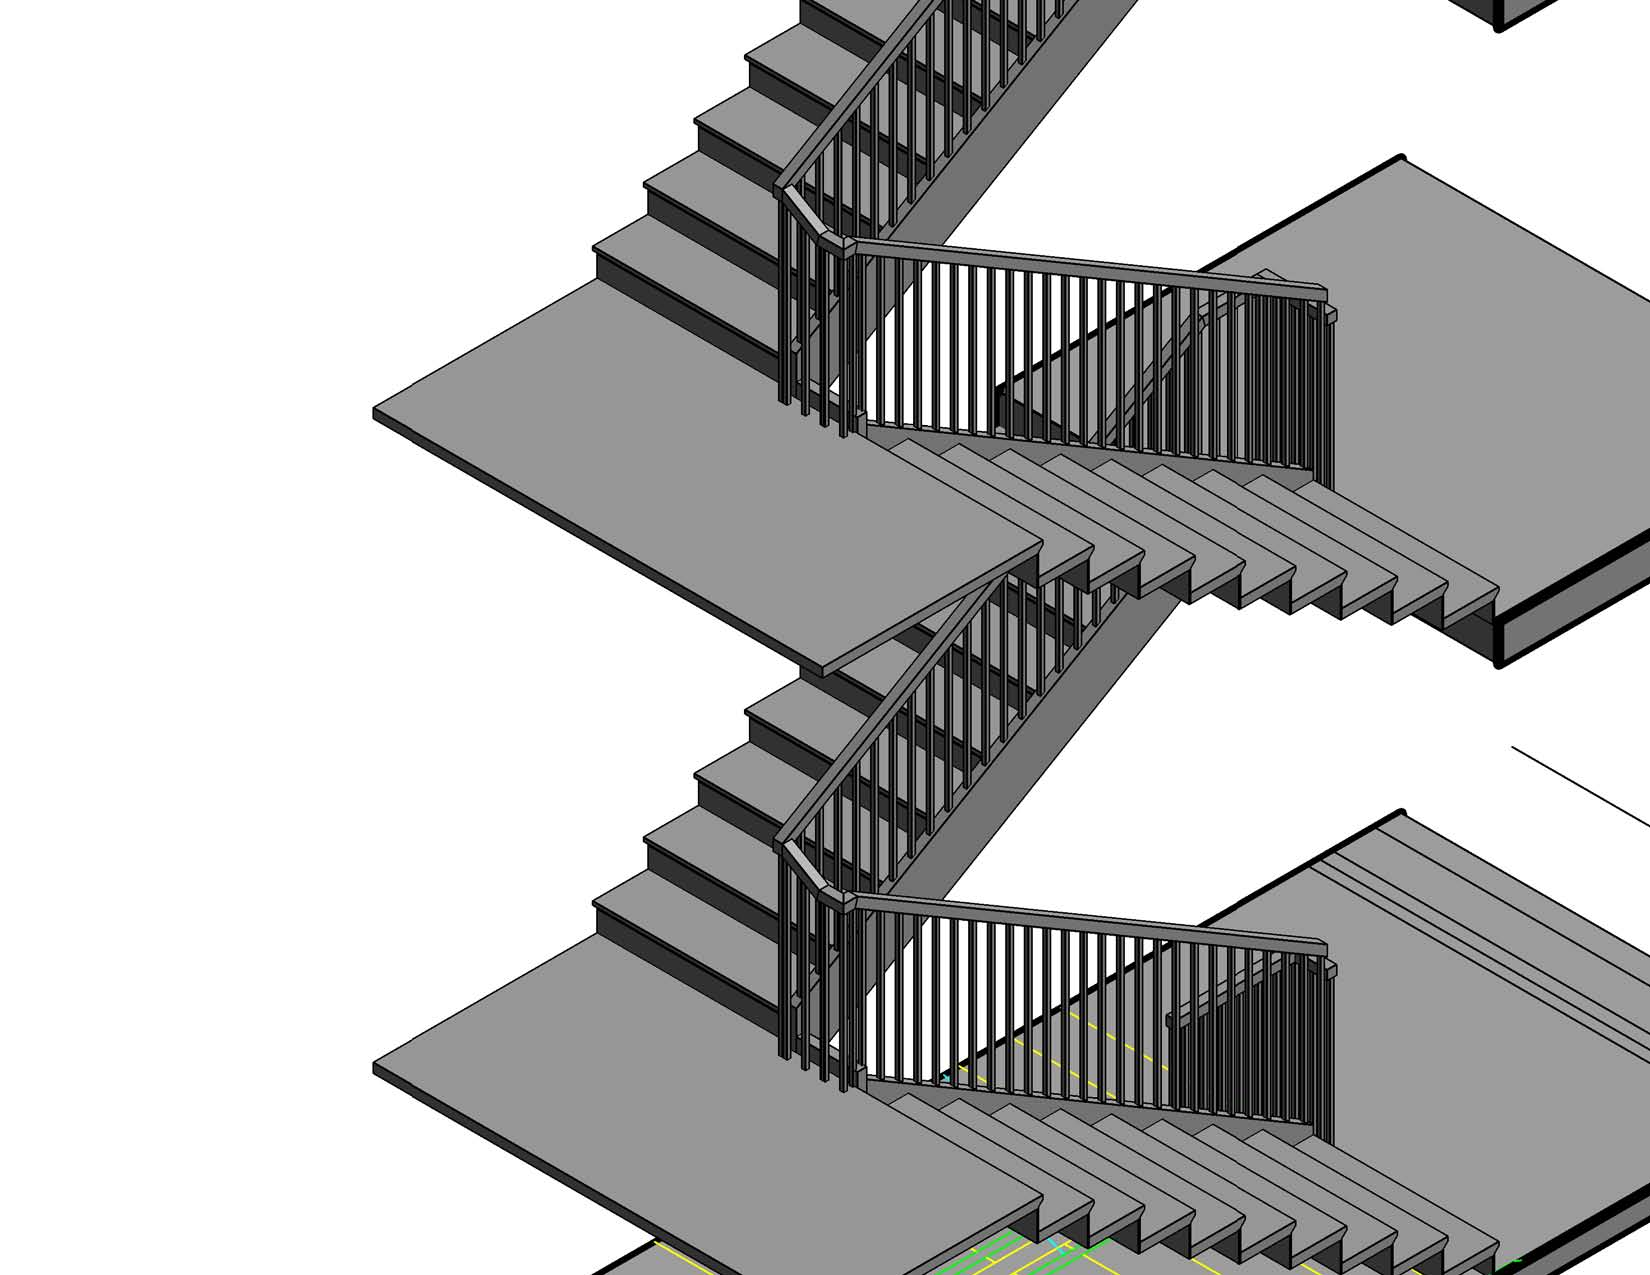 Railing On Stair Revit - Photos Freezer and Stair Iyashix Com